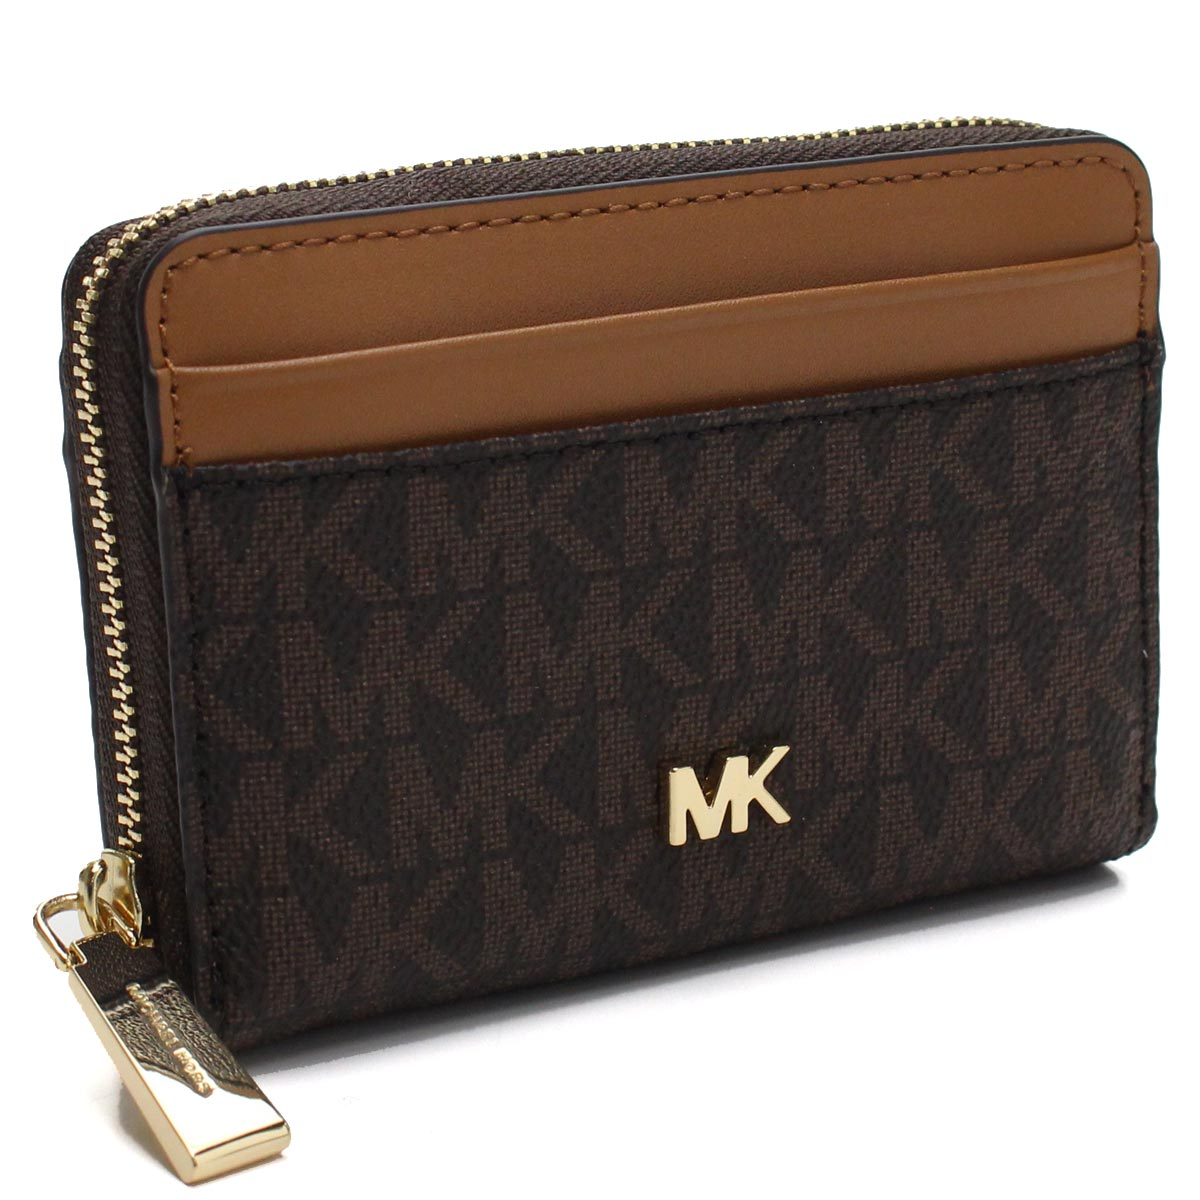 0f6e7fbace4b Bighit The total brand wholesale  Michael Kors MICHAEL KORS MONEY PIECES  coin purse 32F8GF6Z1B 252 BRN ACORN brown system